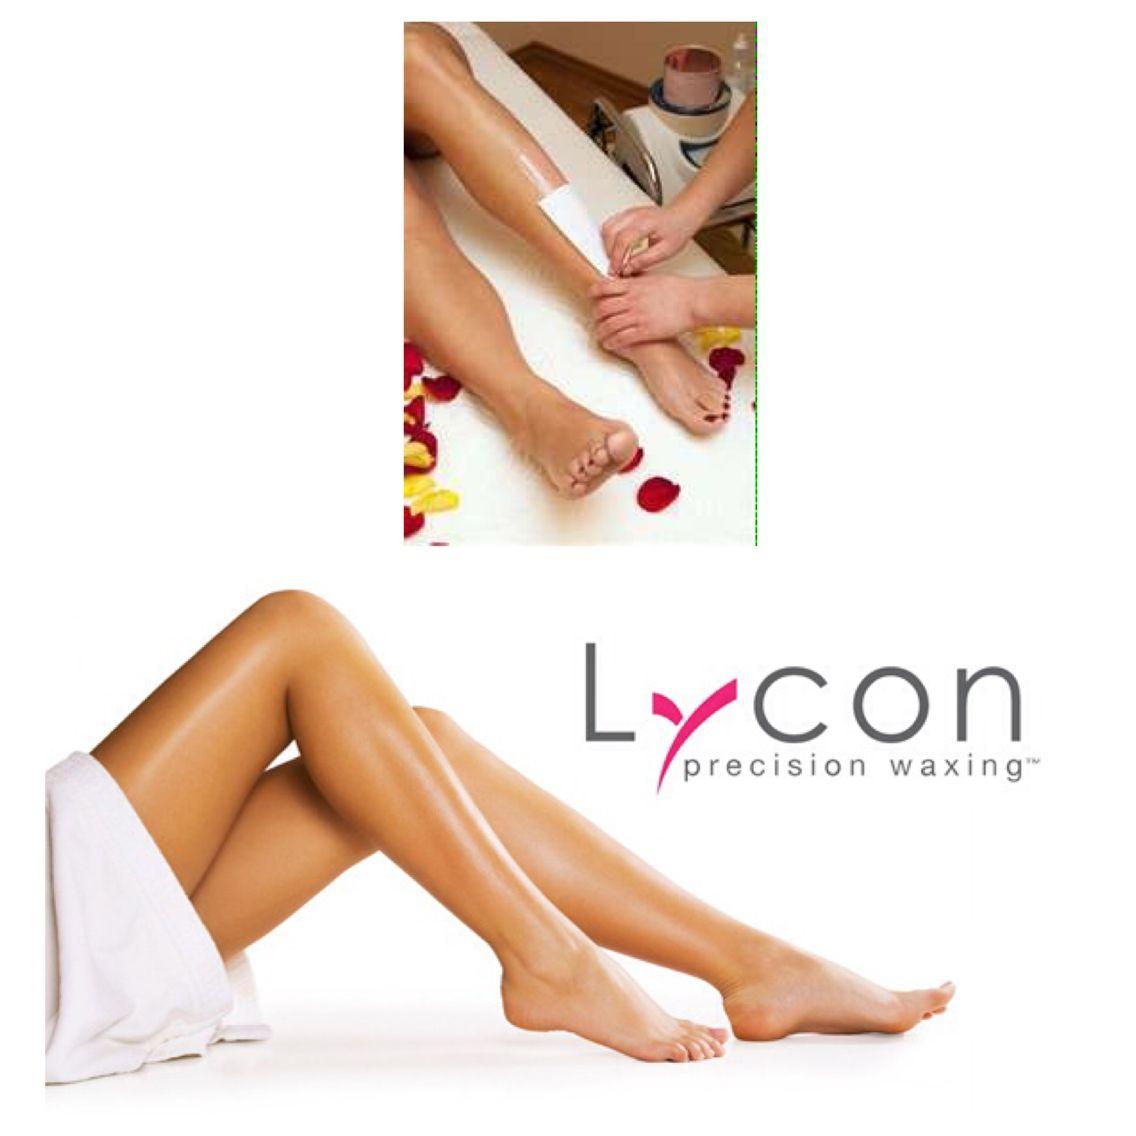 lycon wax trainings pinterest lycon wax